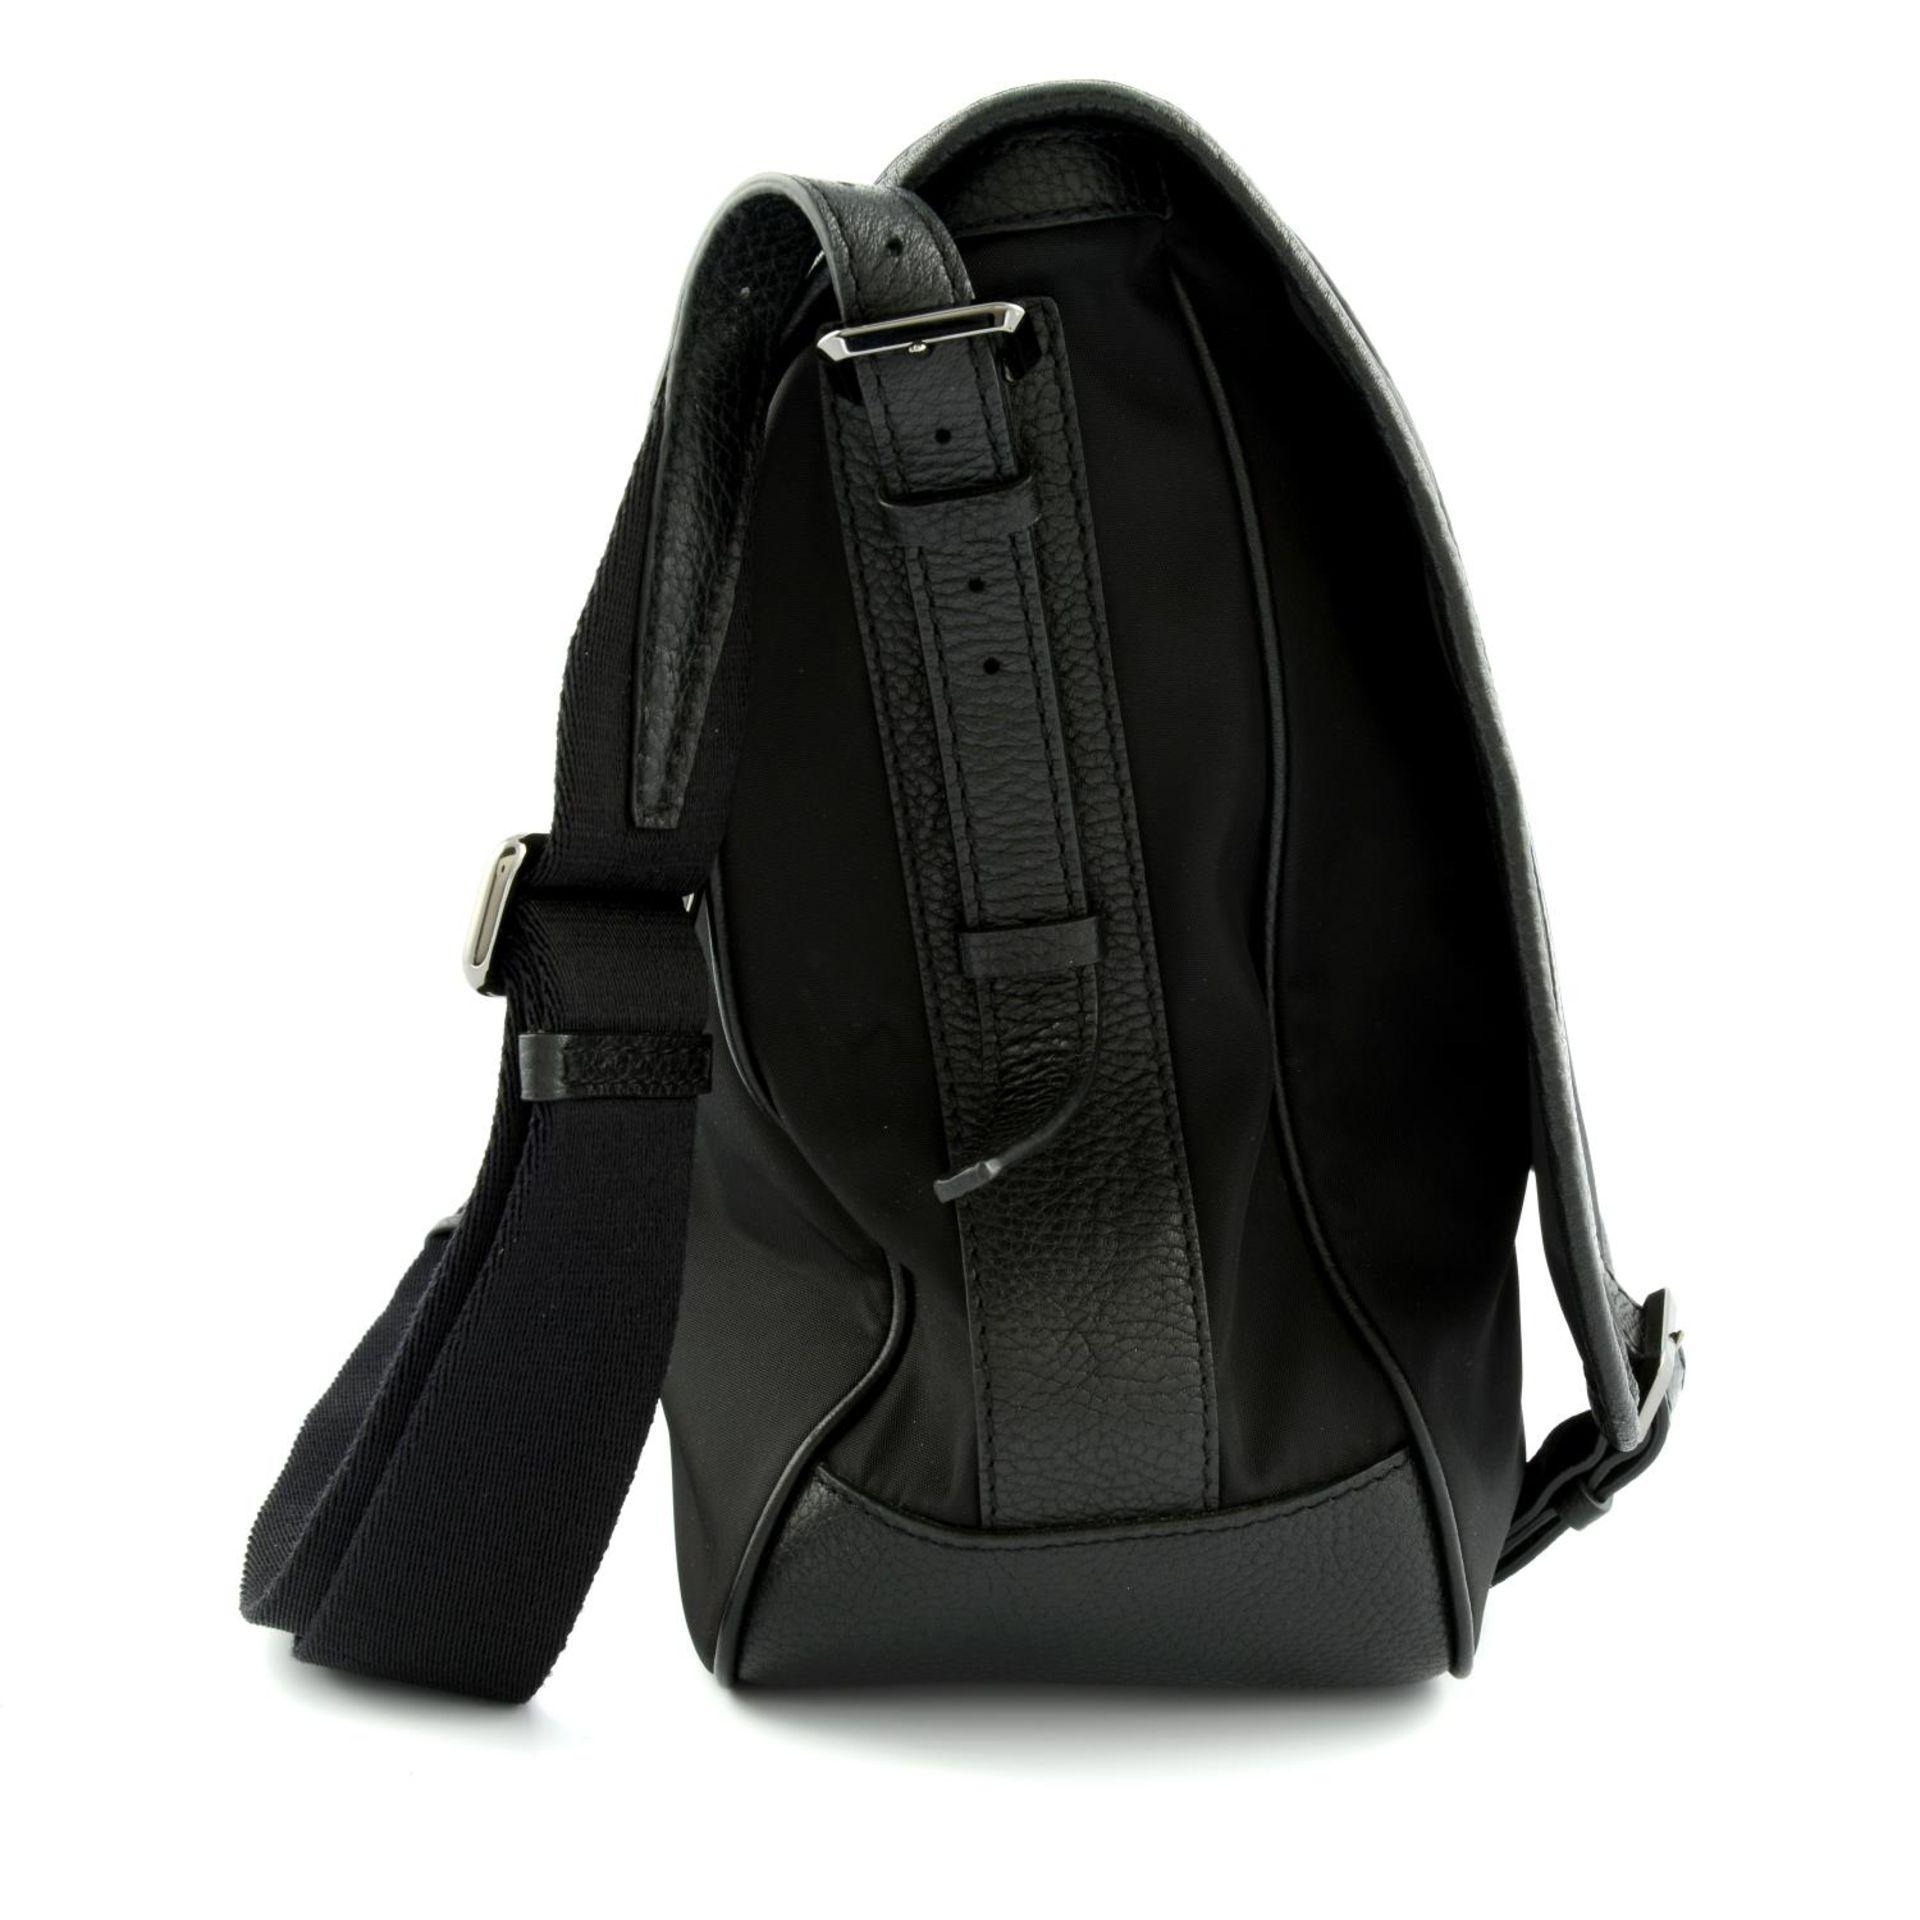 BURBERRY - a nylon messenger satchel. - Image 4 of 5